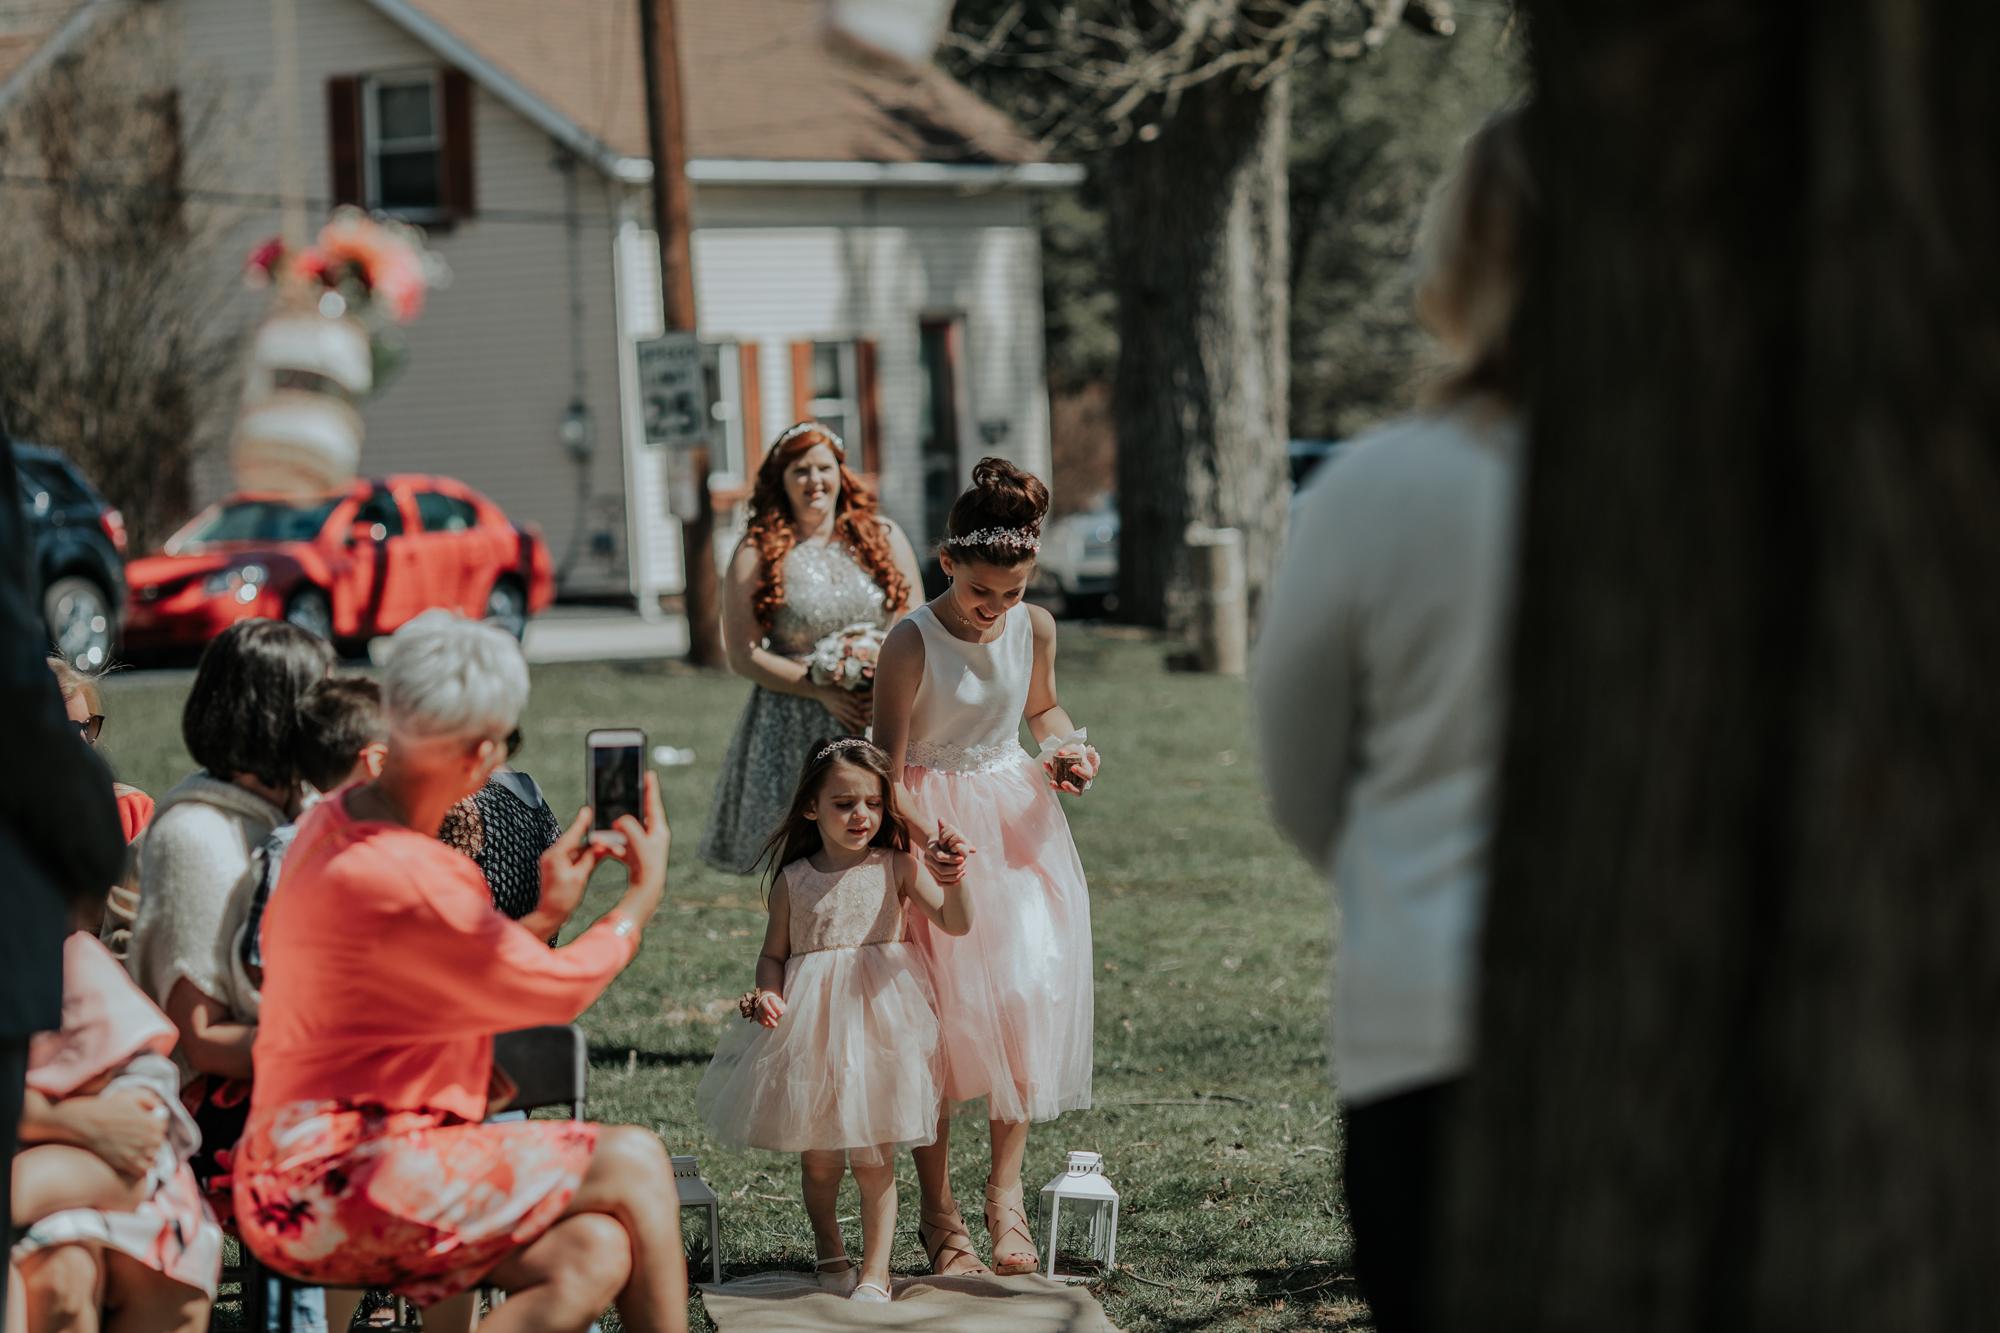 bridal-procession-easton-pennsylvania-wedding-photographers